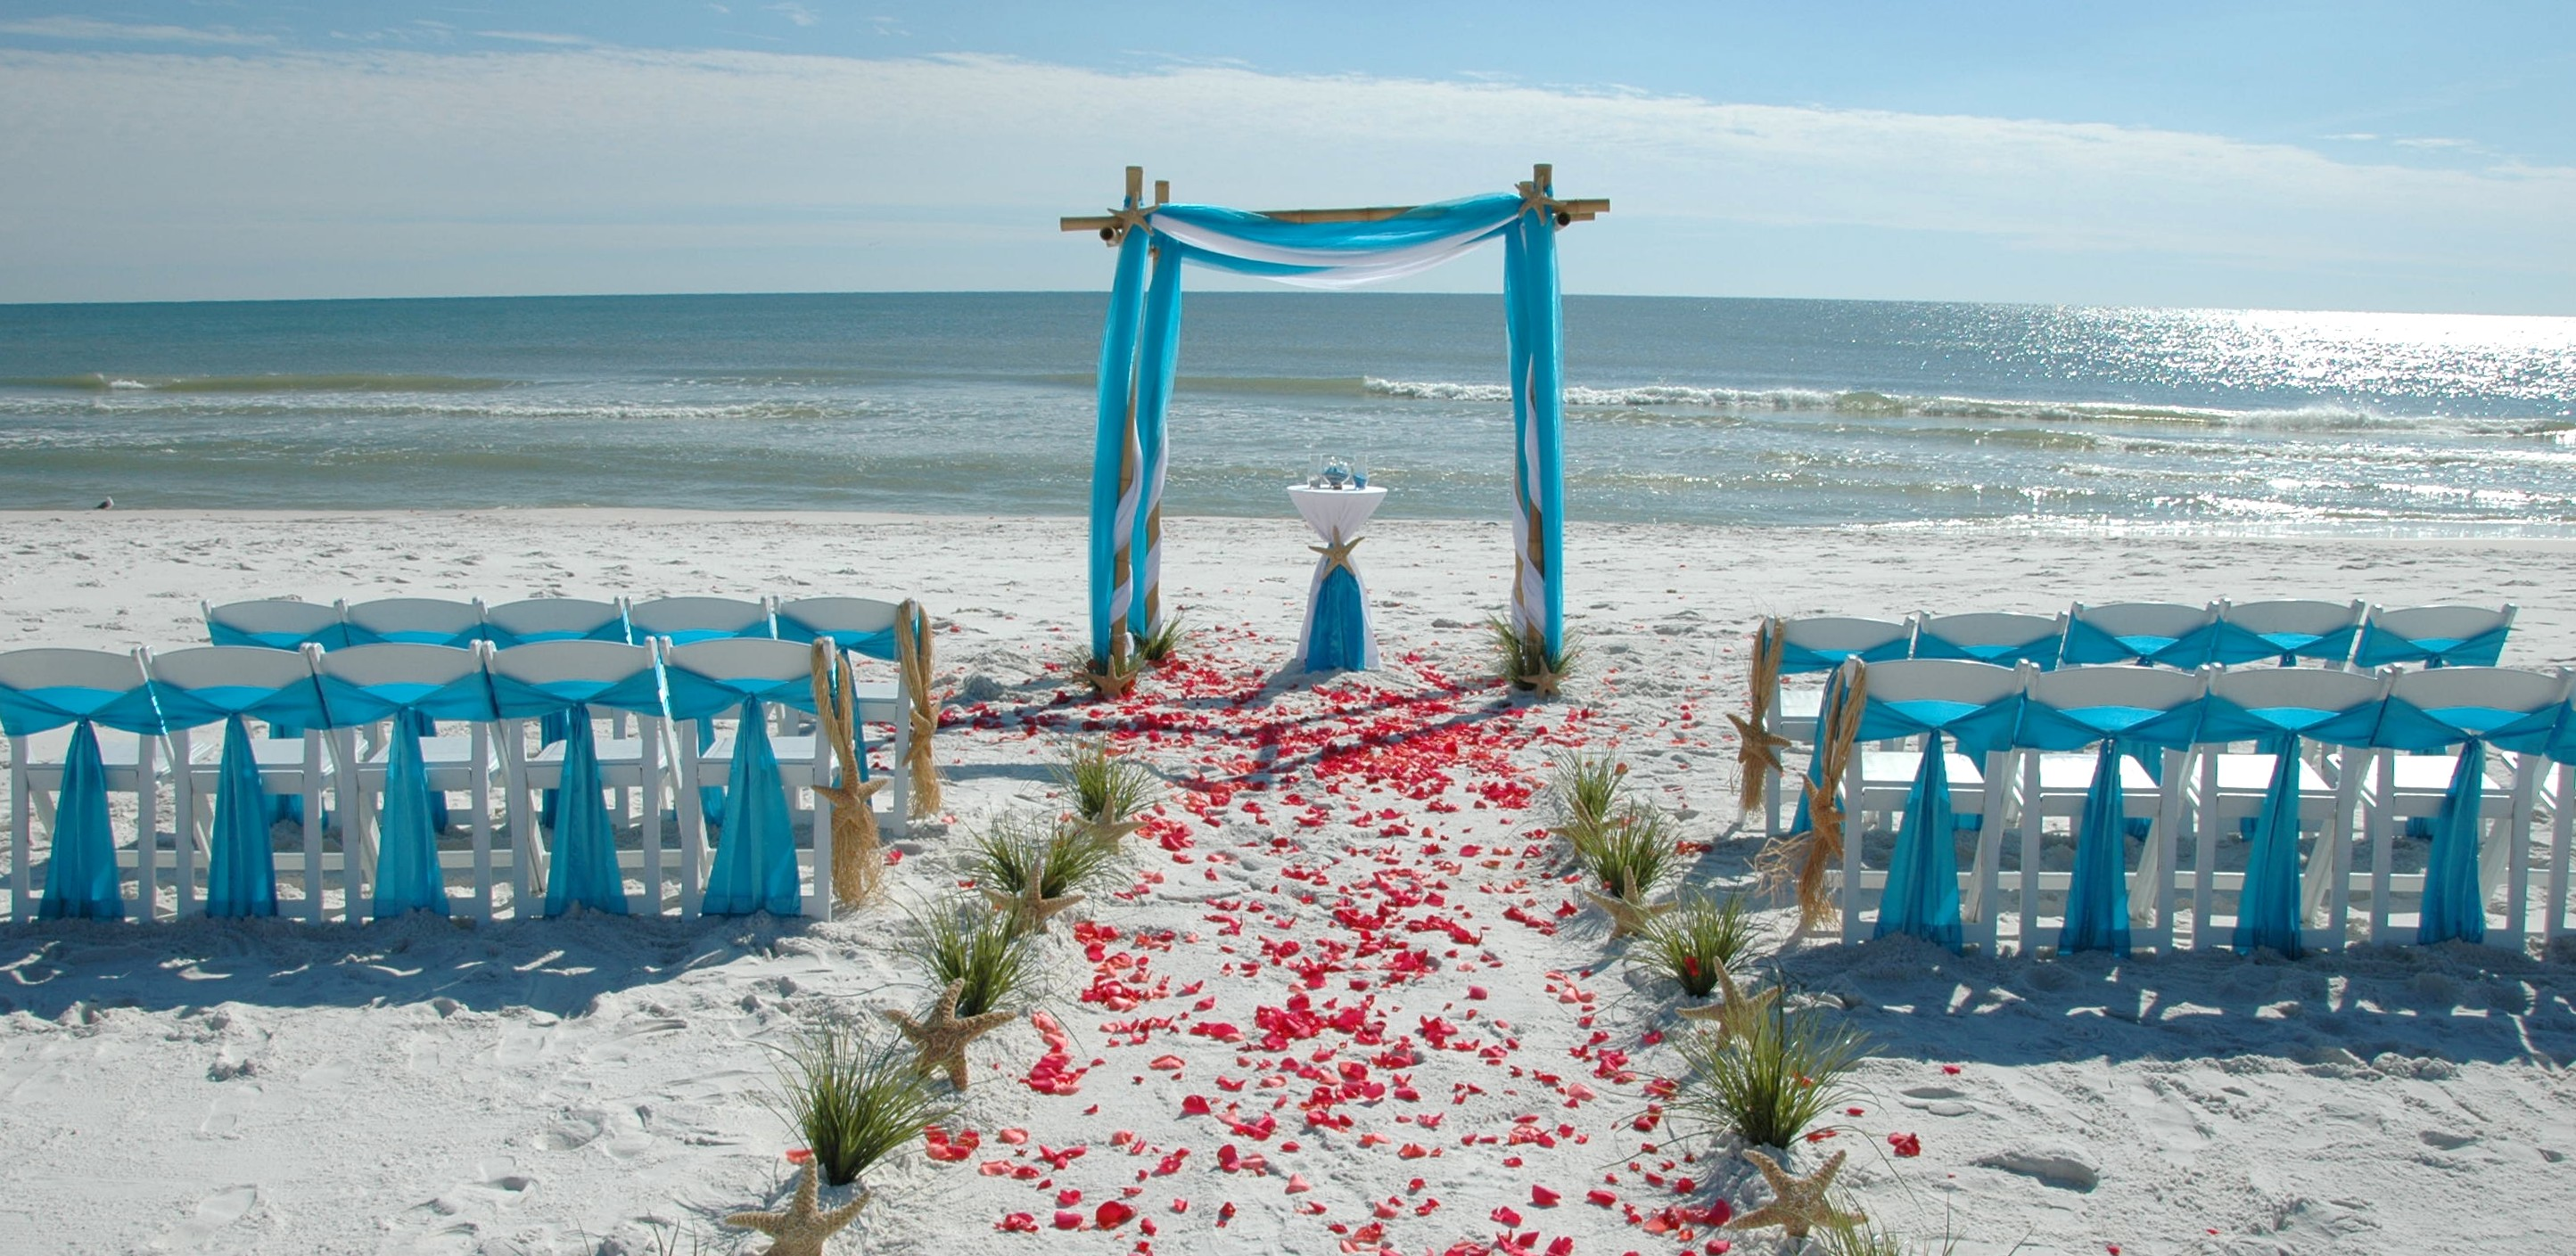 Beaches-image-beaches-36161436-2889-1409